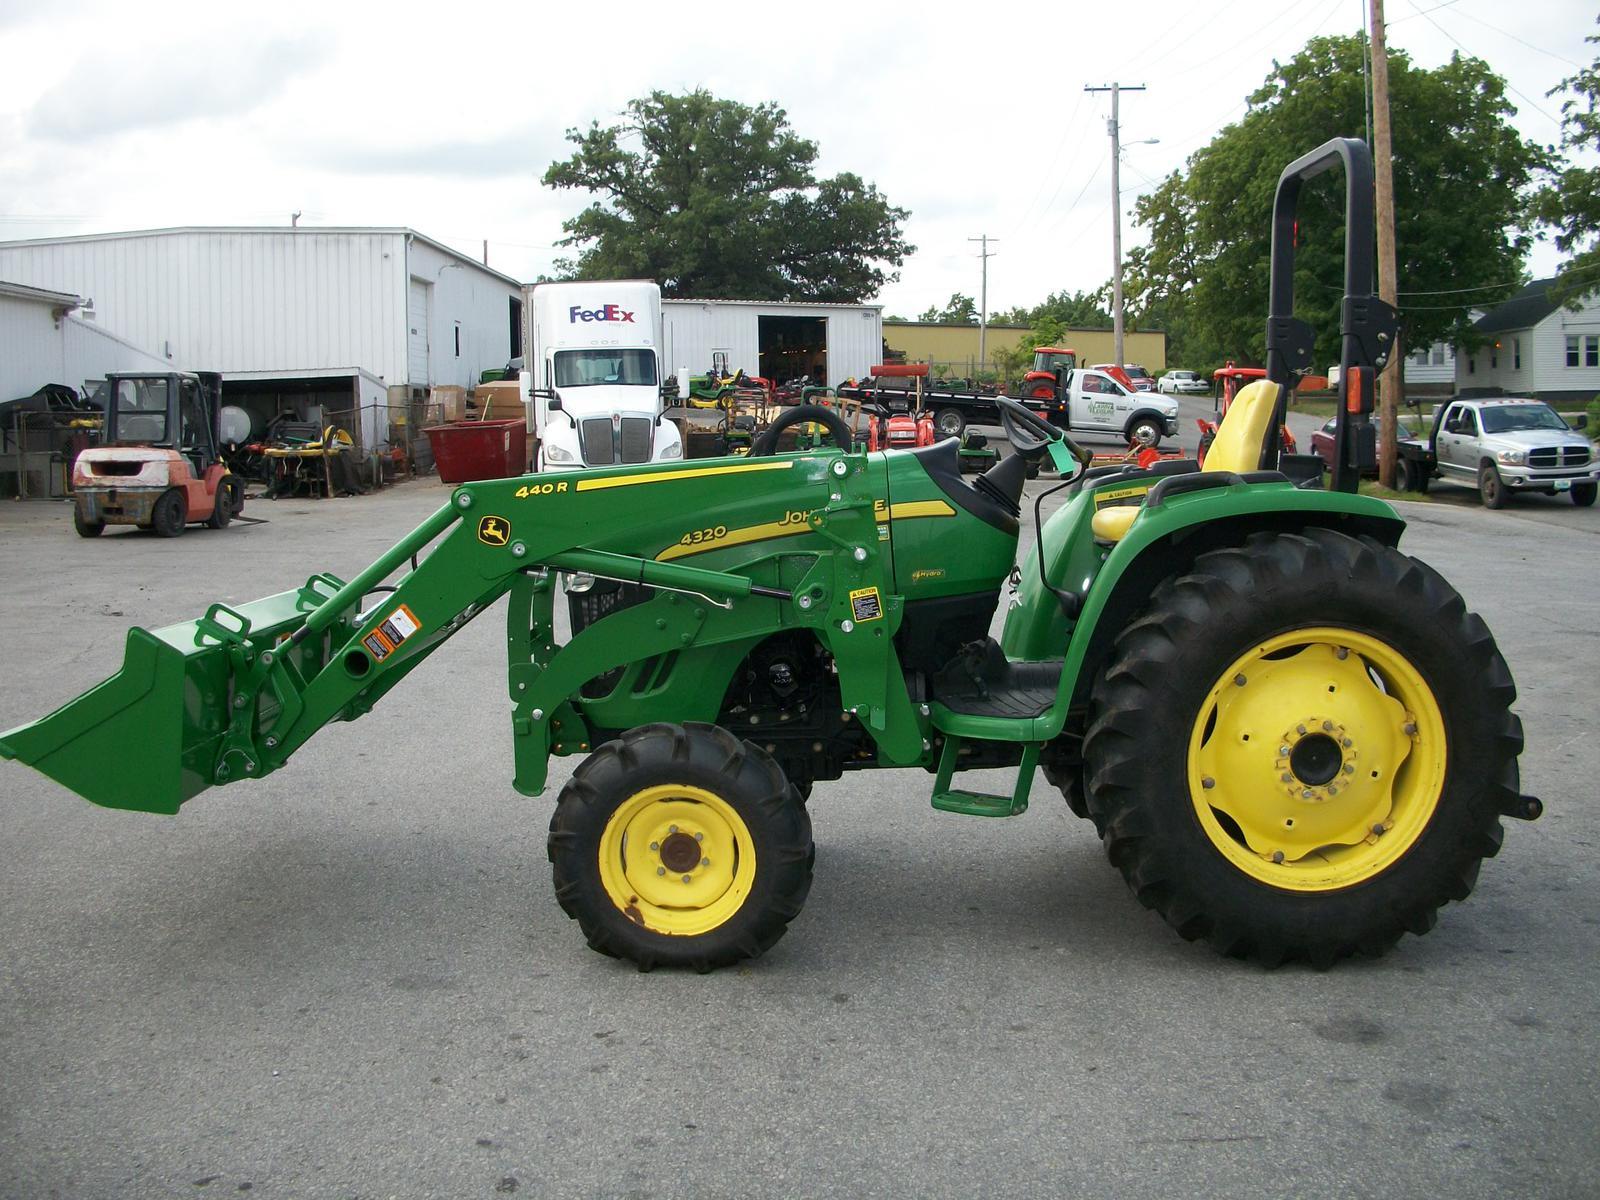 2007 John Deere 4320 Compact Tractor (48 Hp) For Sale In Columbia JD 4320  Wiring-Diagram John Deere 4320 Compact Parts Diagrams